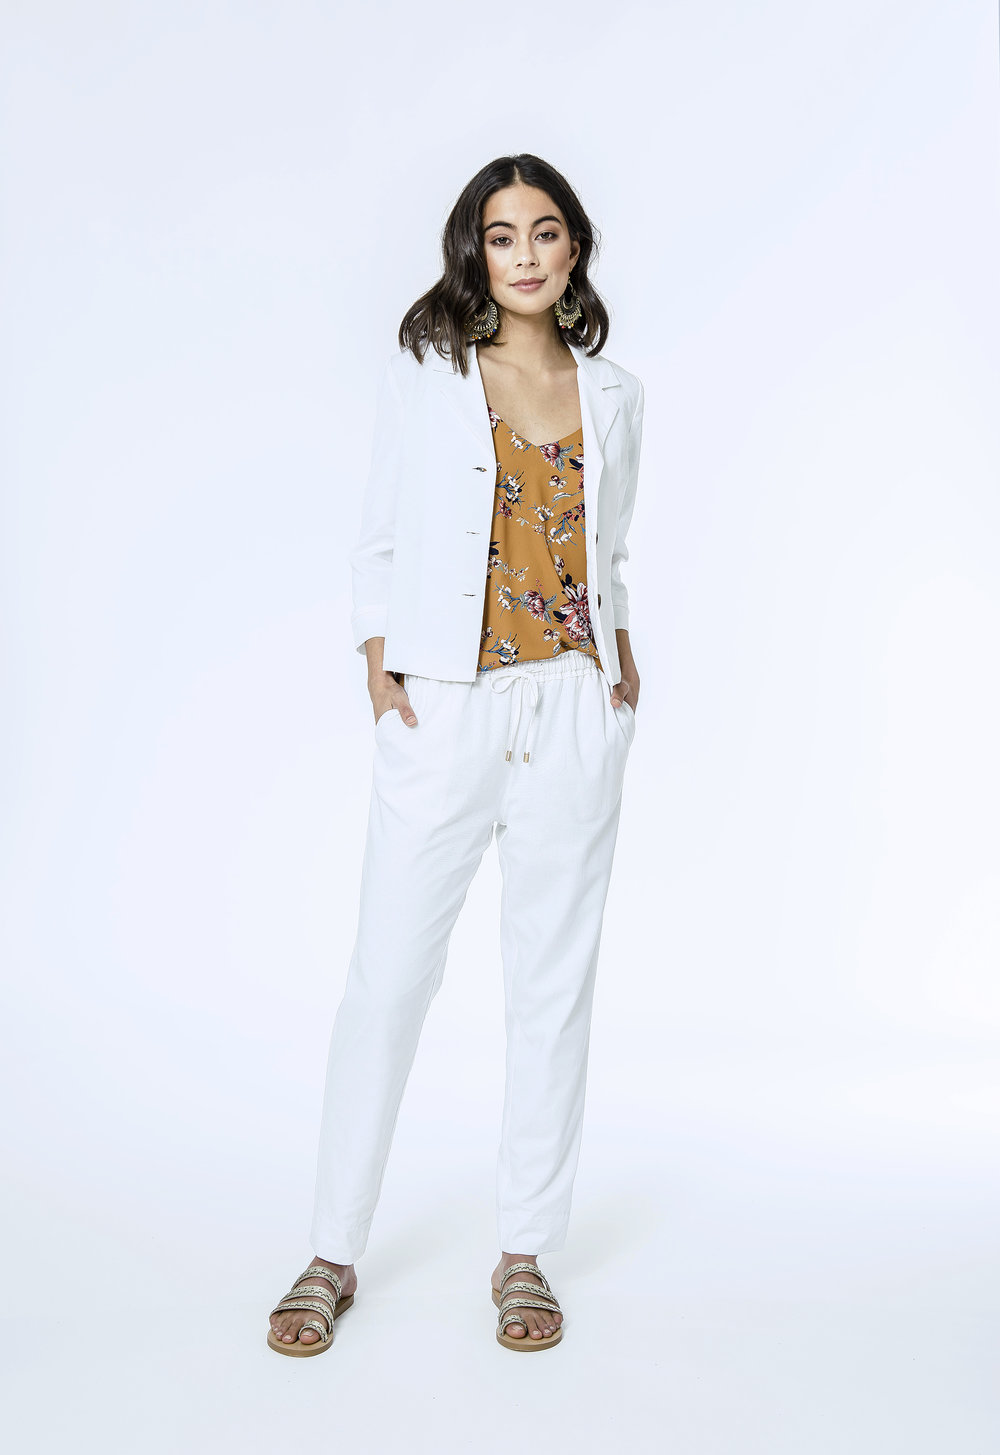 Caroline Jacket & Yve Pants